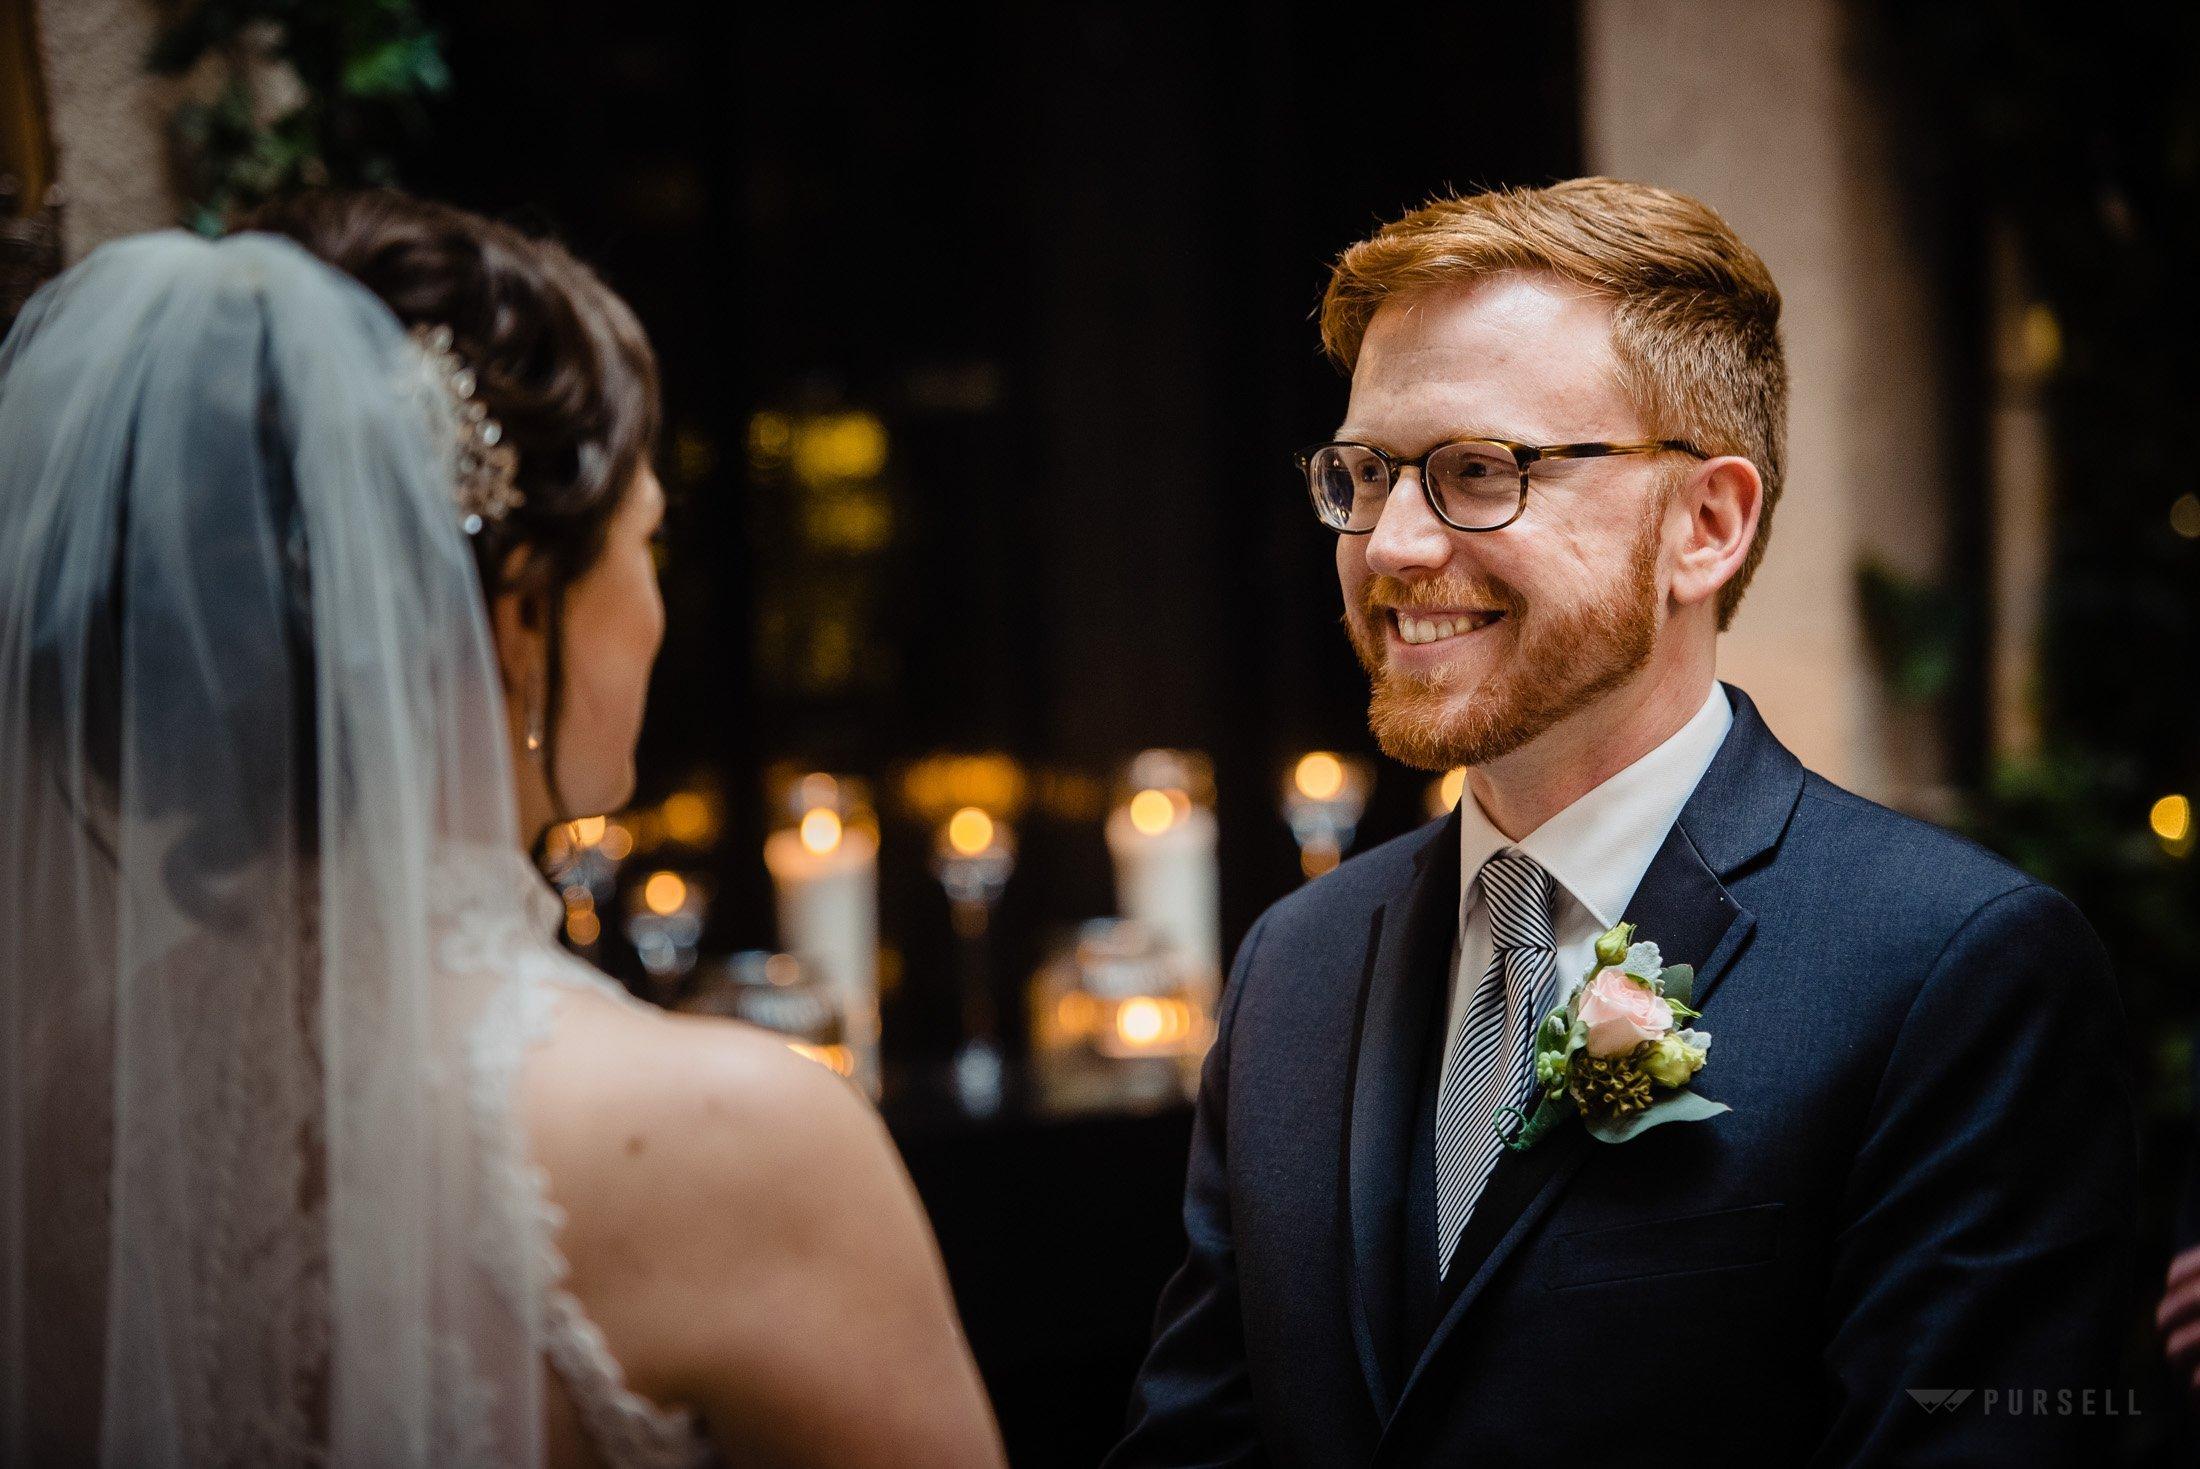 026 - intimate wedding